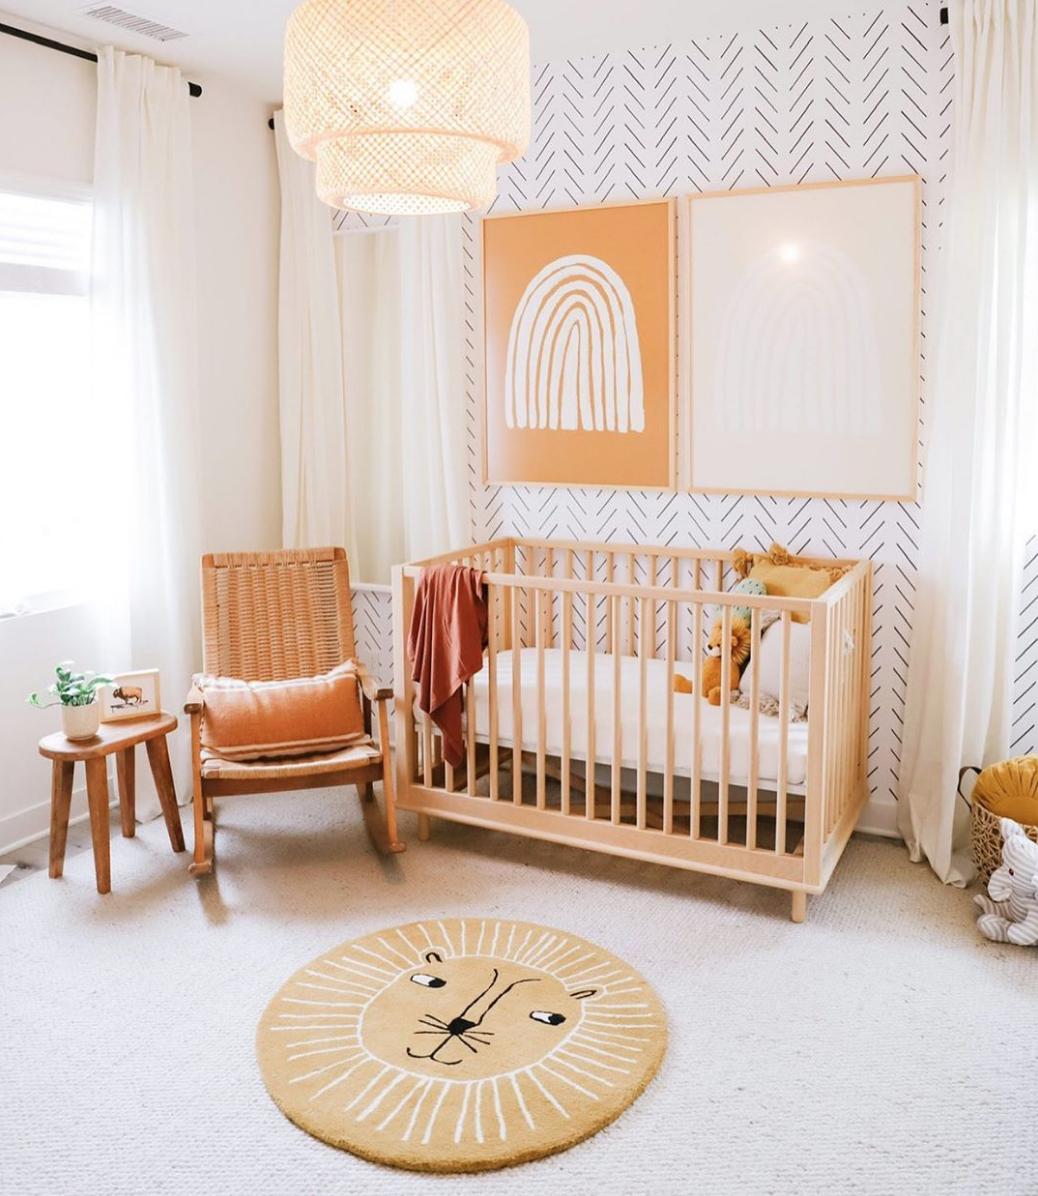 Non Toxic Safe Vegan Baby & Kids Rooms | Nursery Room Design, Nursery Baby Room, Baby Nursery Decor